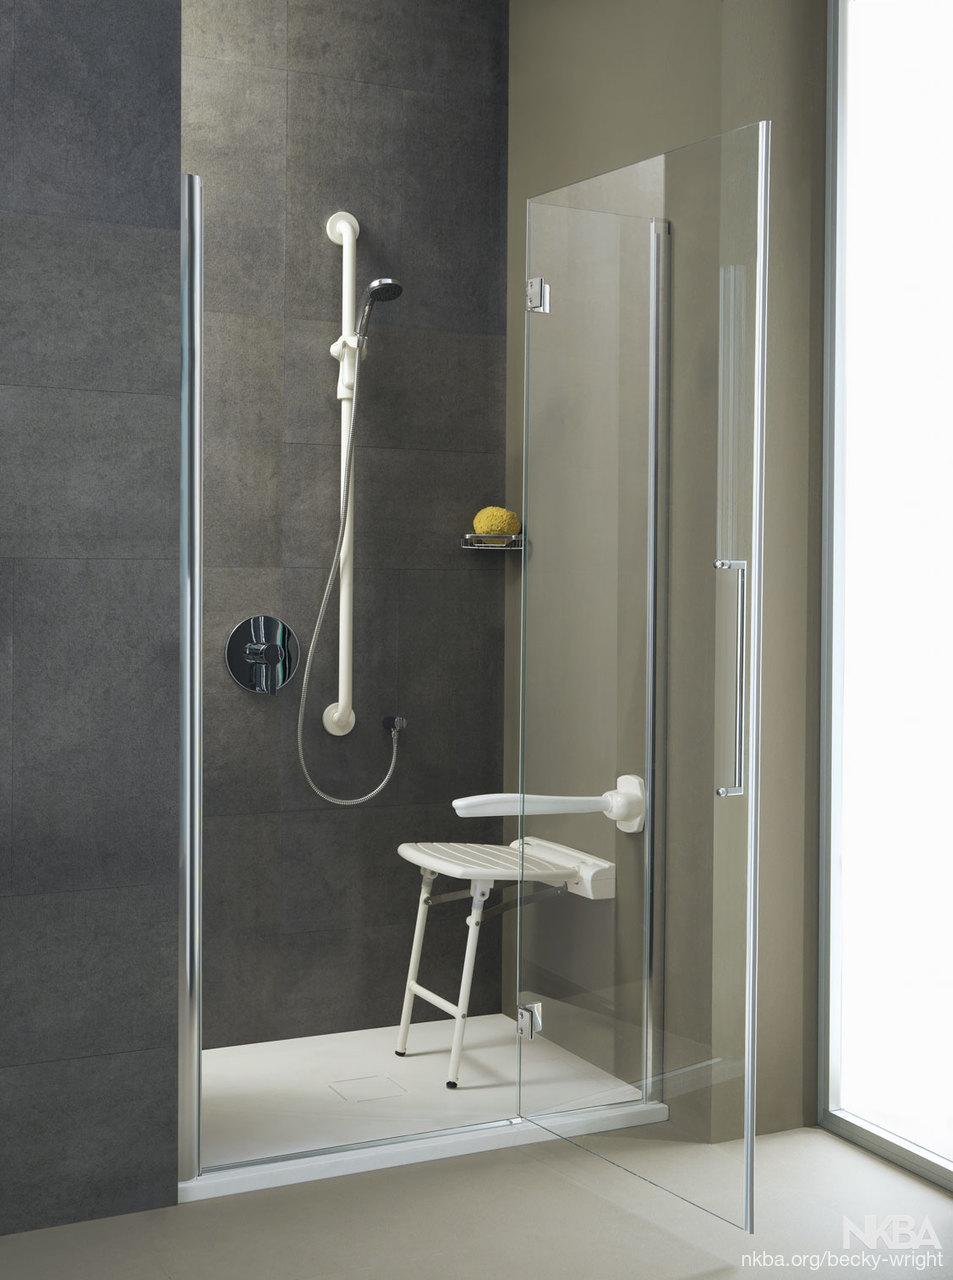 Folding Shower Seat with Legs - NKBA